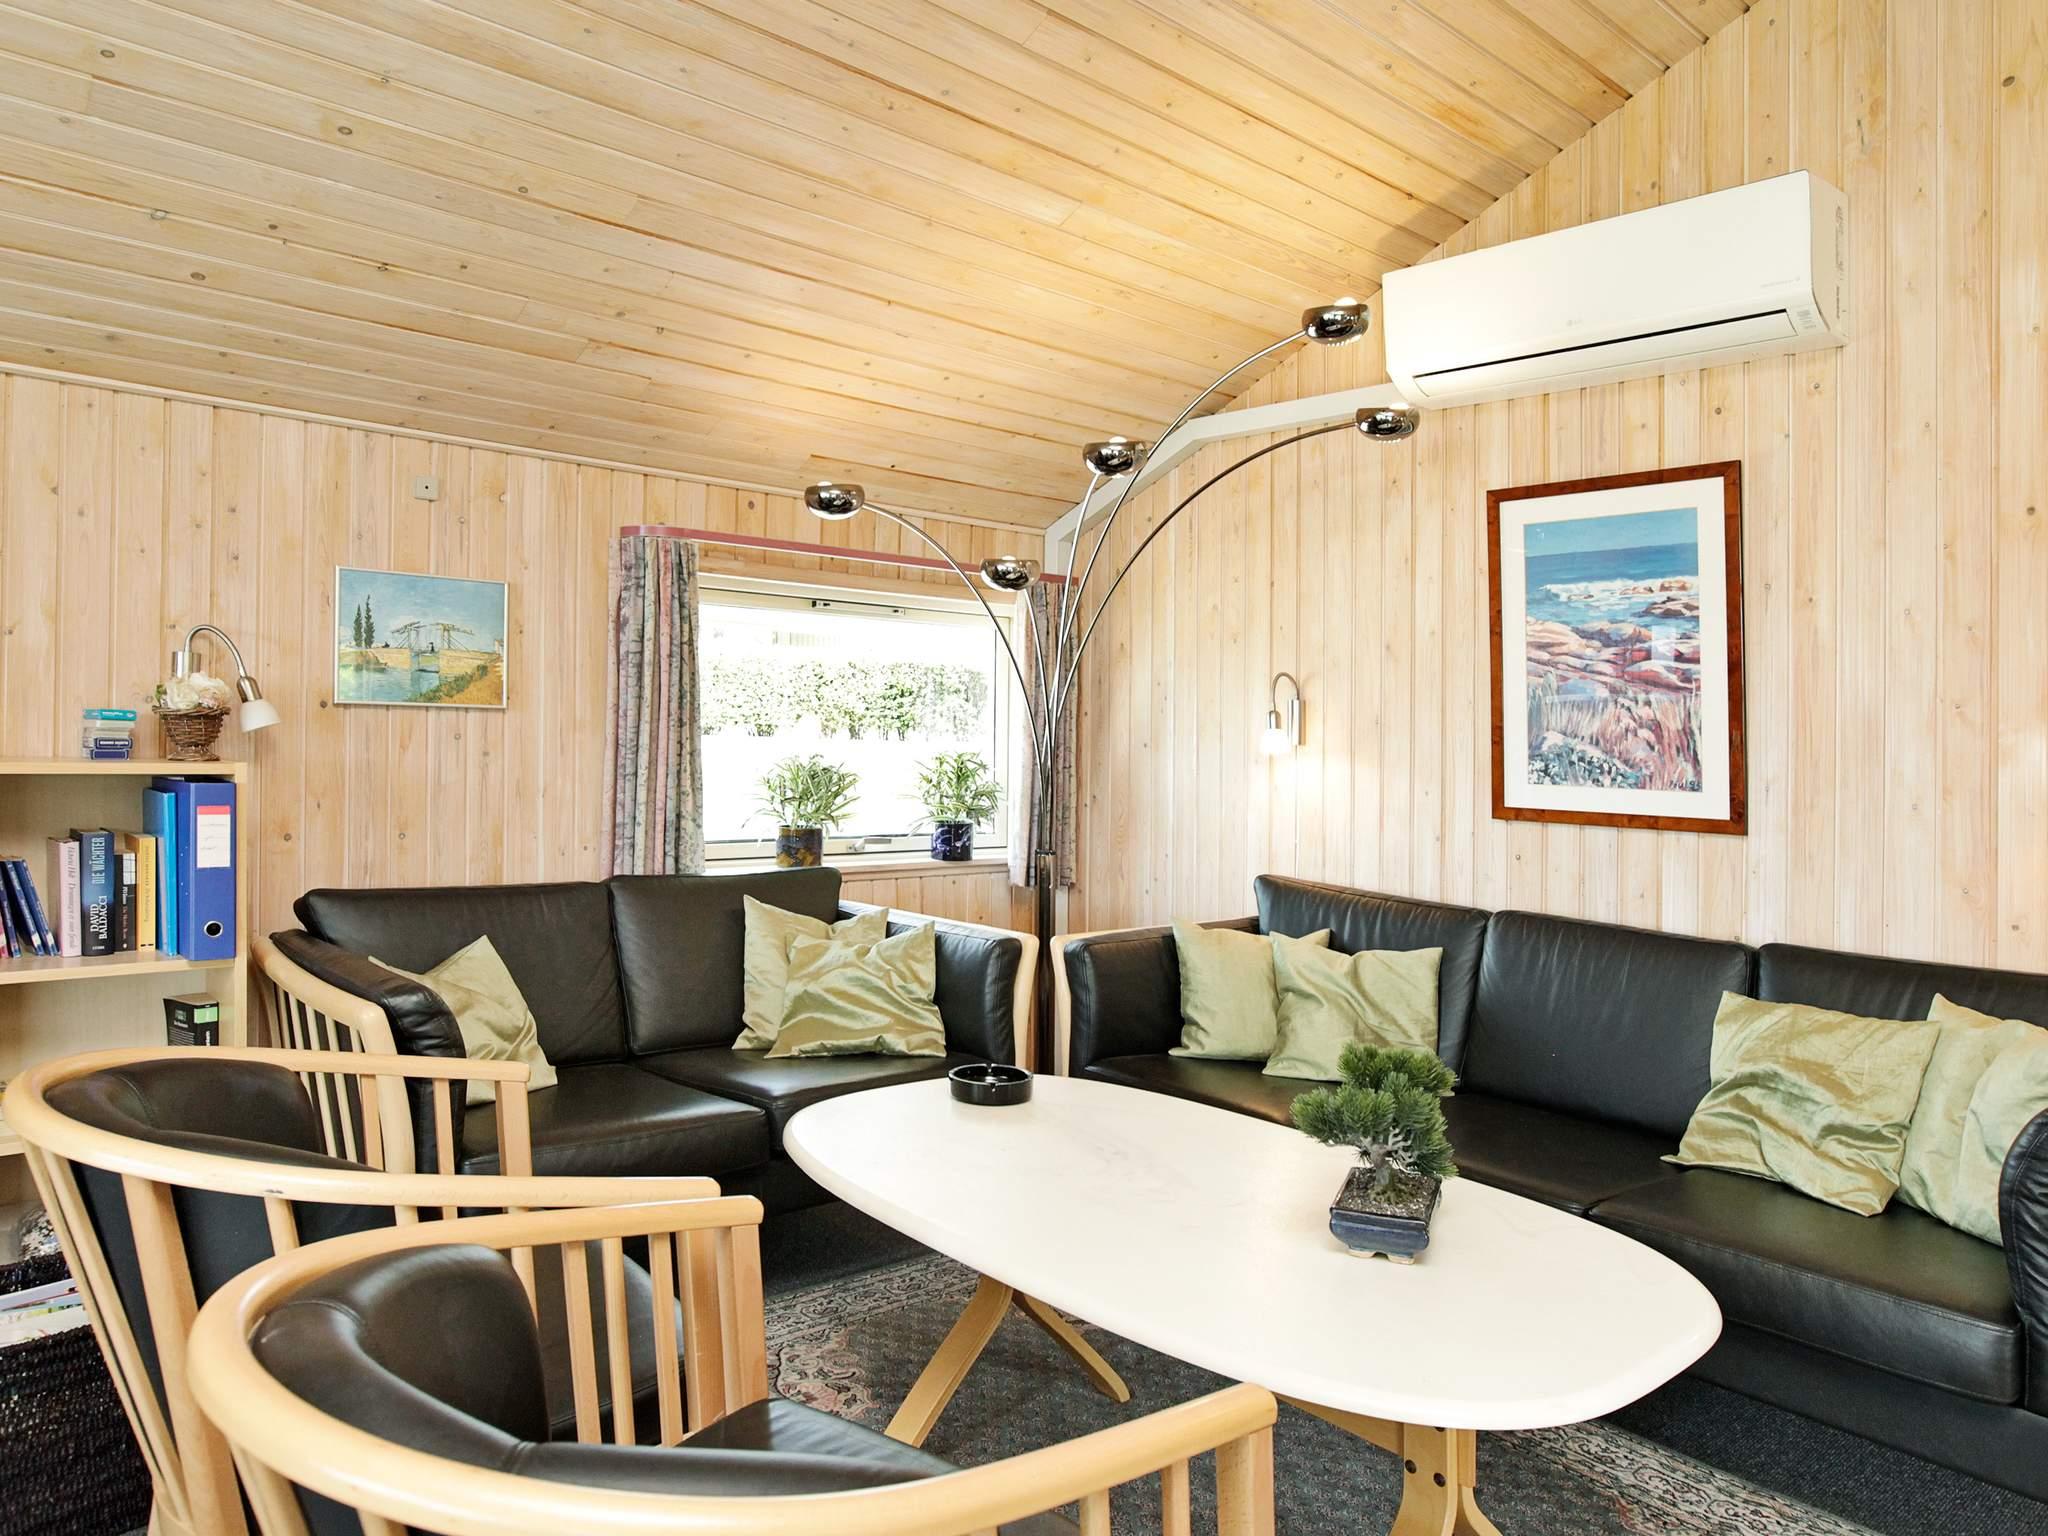 Maison de vacances Falsled (87545), Faldsled, , Fionie, Danemark, image 5